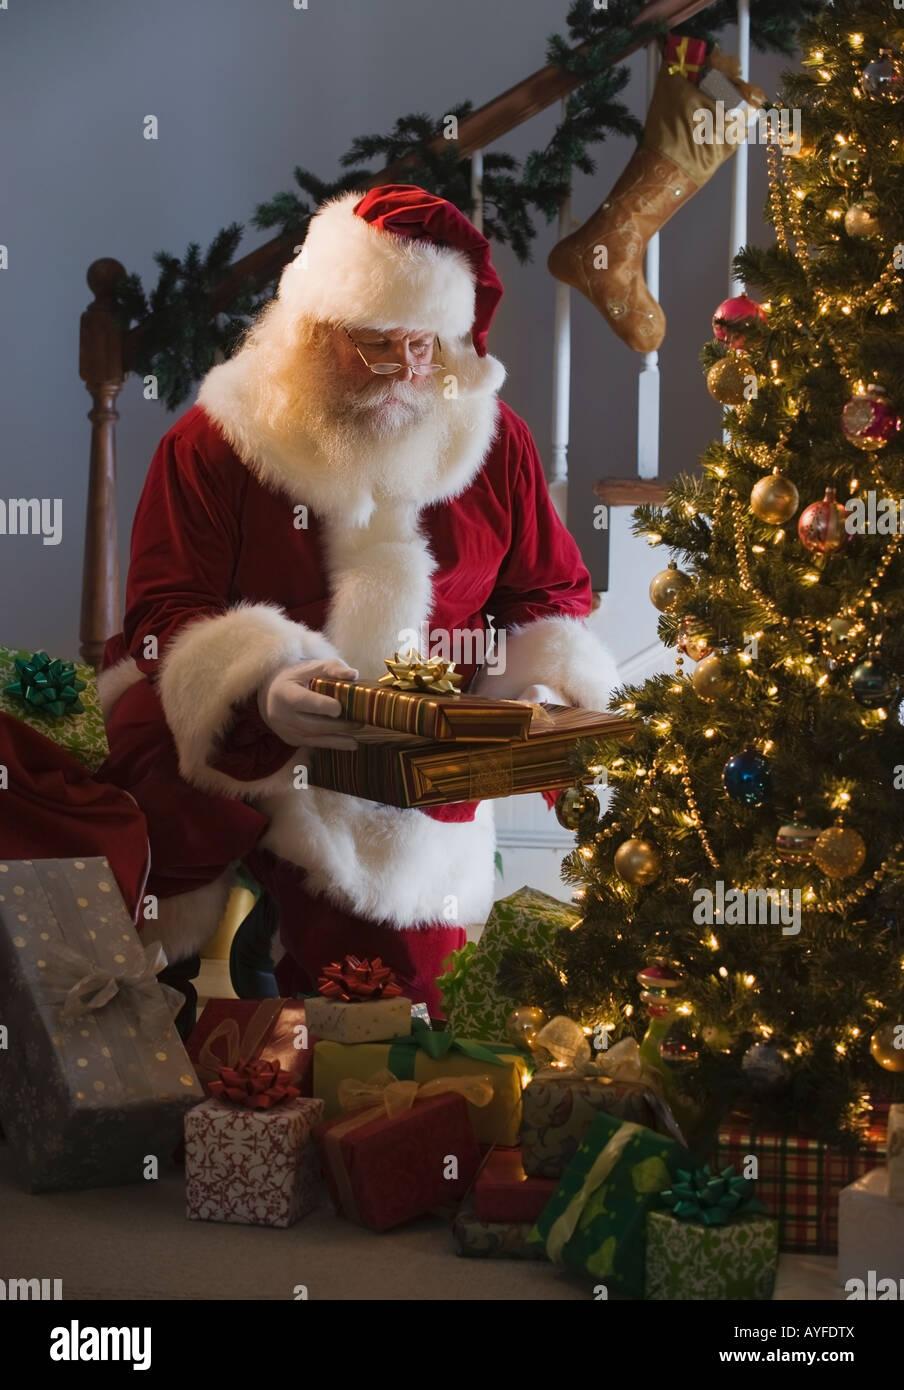 Santa Claus leaving gifts under Christmas tree Stock Photo: 17092729 ...